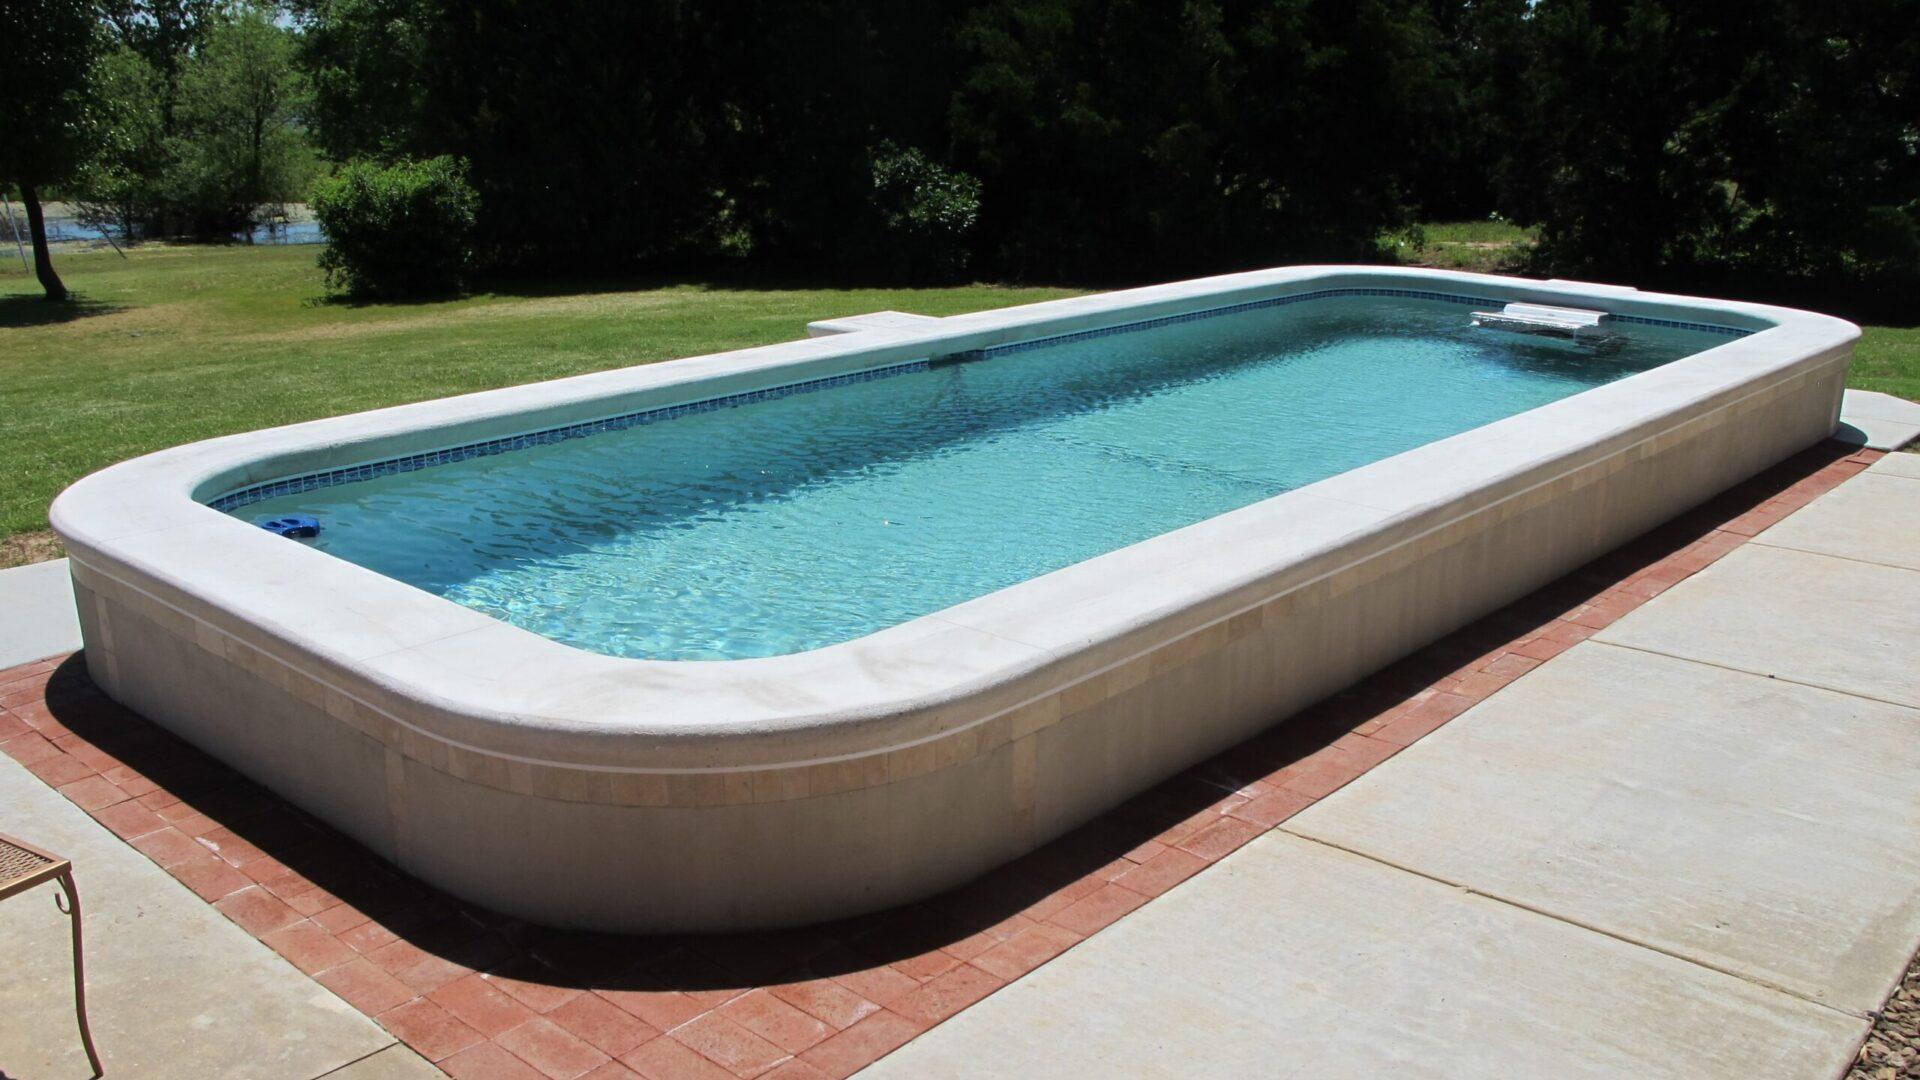 ICF Swimming Pool